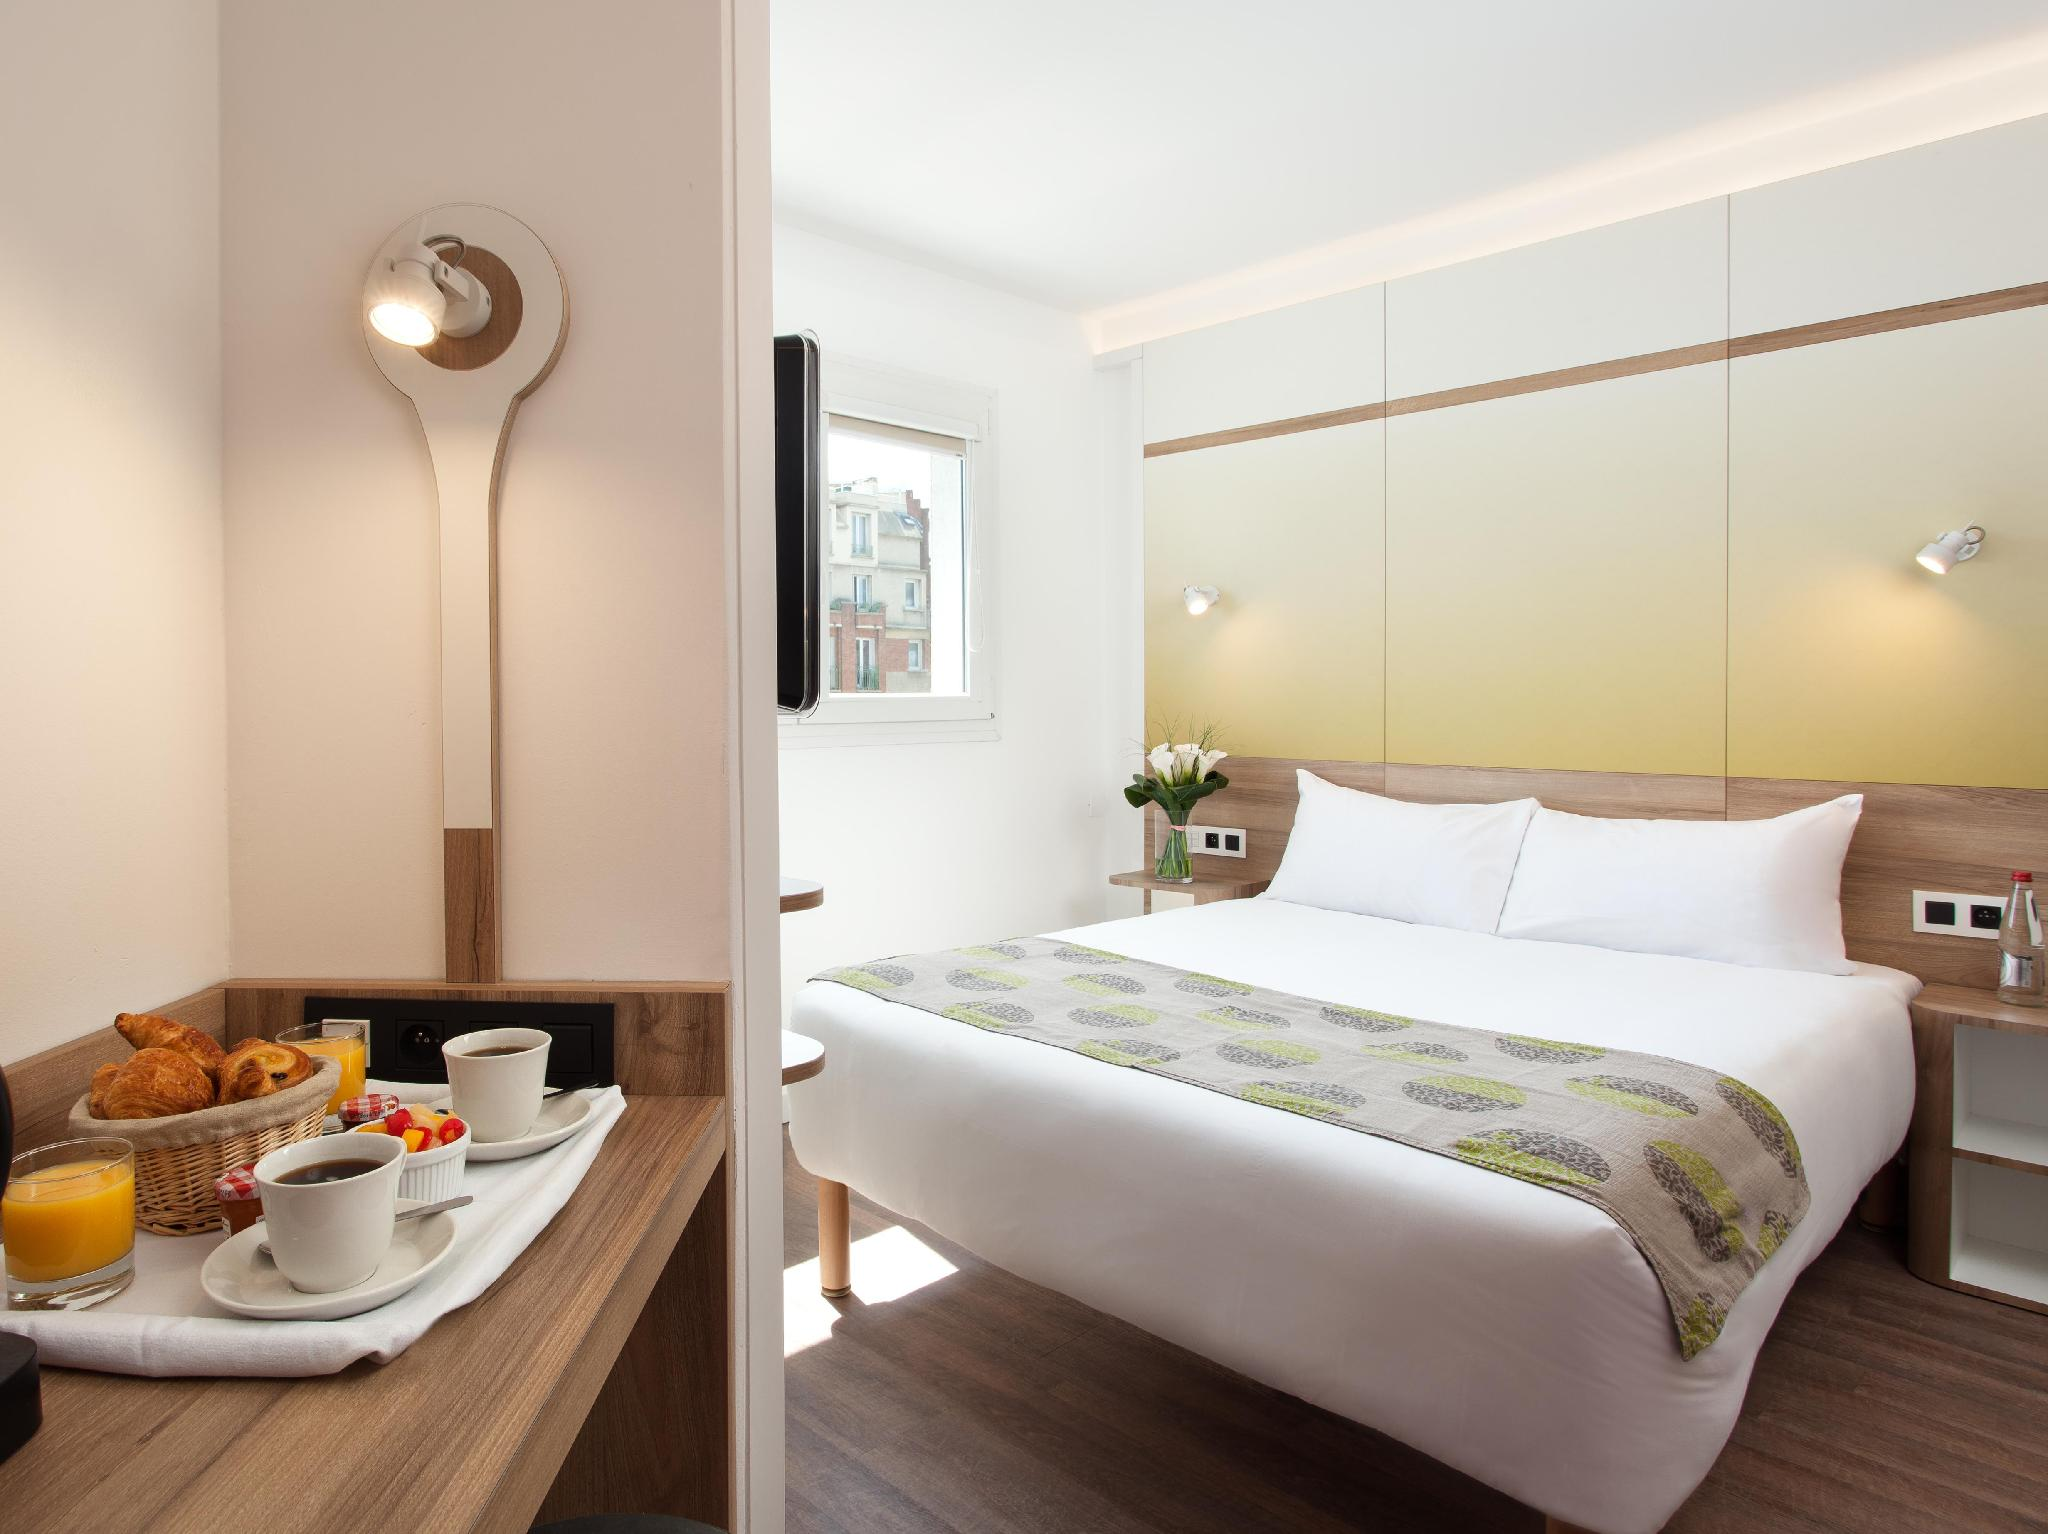 Best price on median paris porte de versailles hotel in paris reviews - Hotel median porte de versailles ...